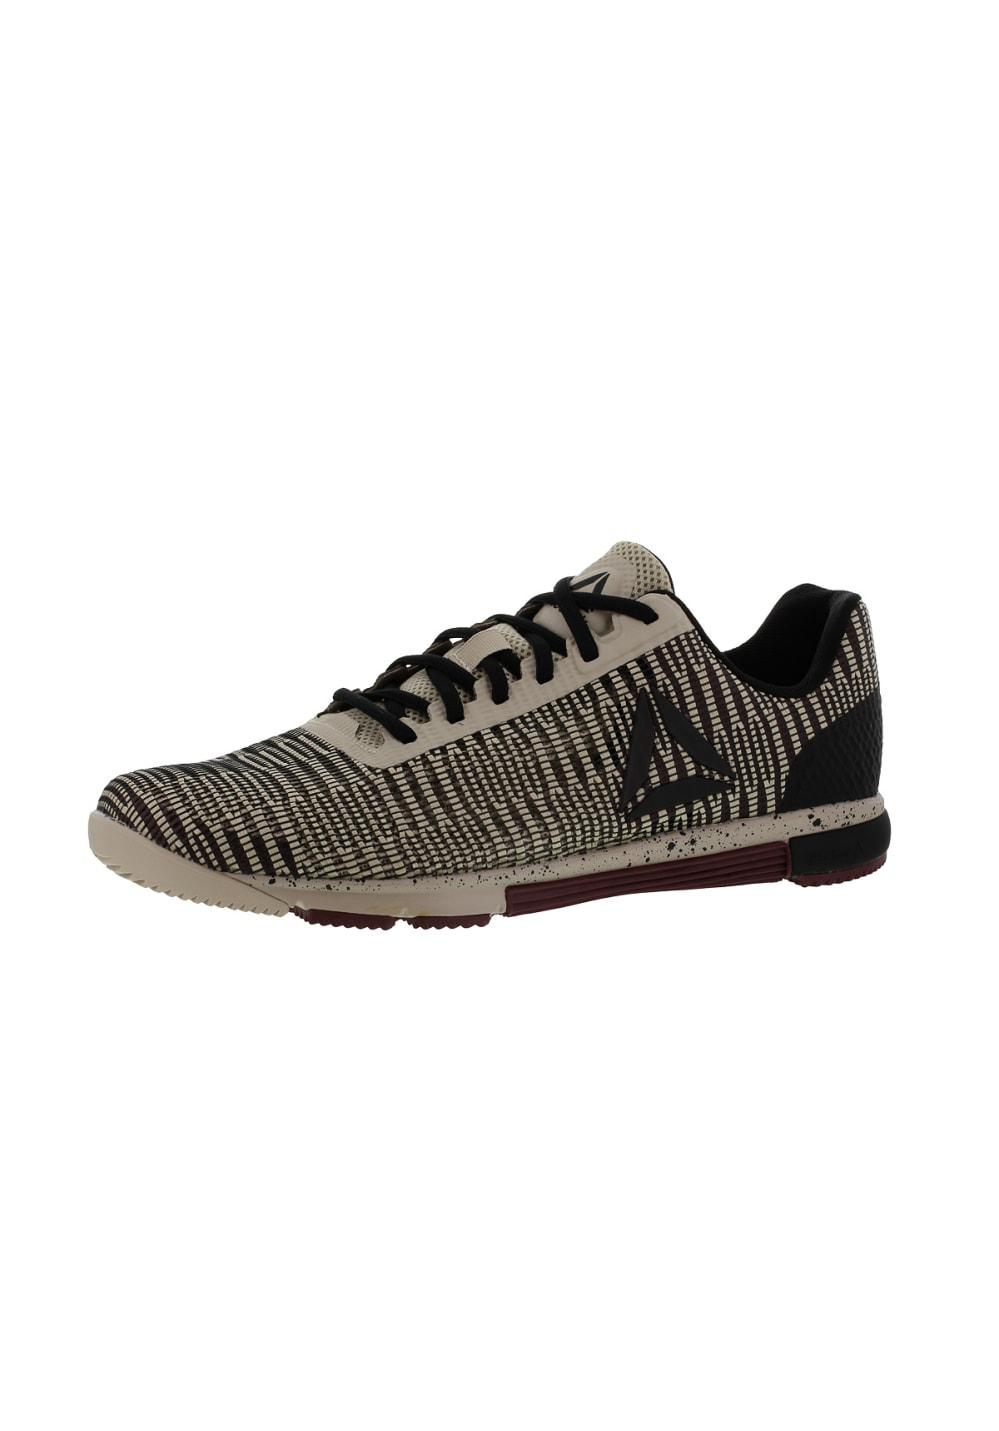 4c296e86db63 Reebok Speed Tr Flexweave - Fitness shoes for Men - Beige